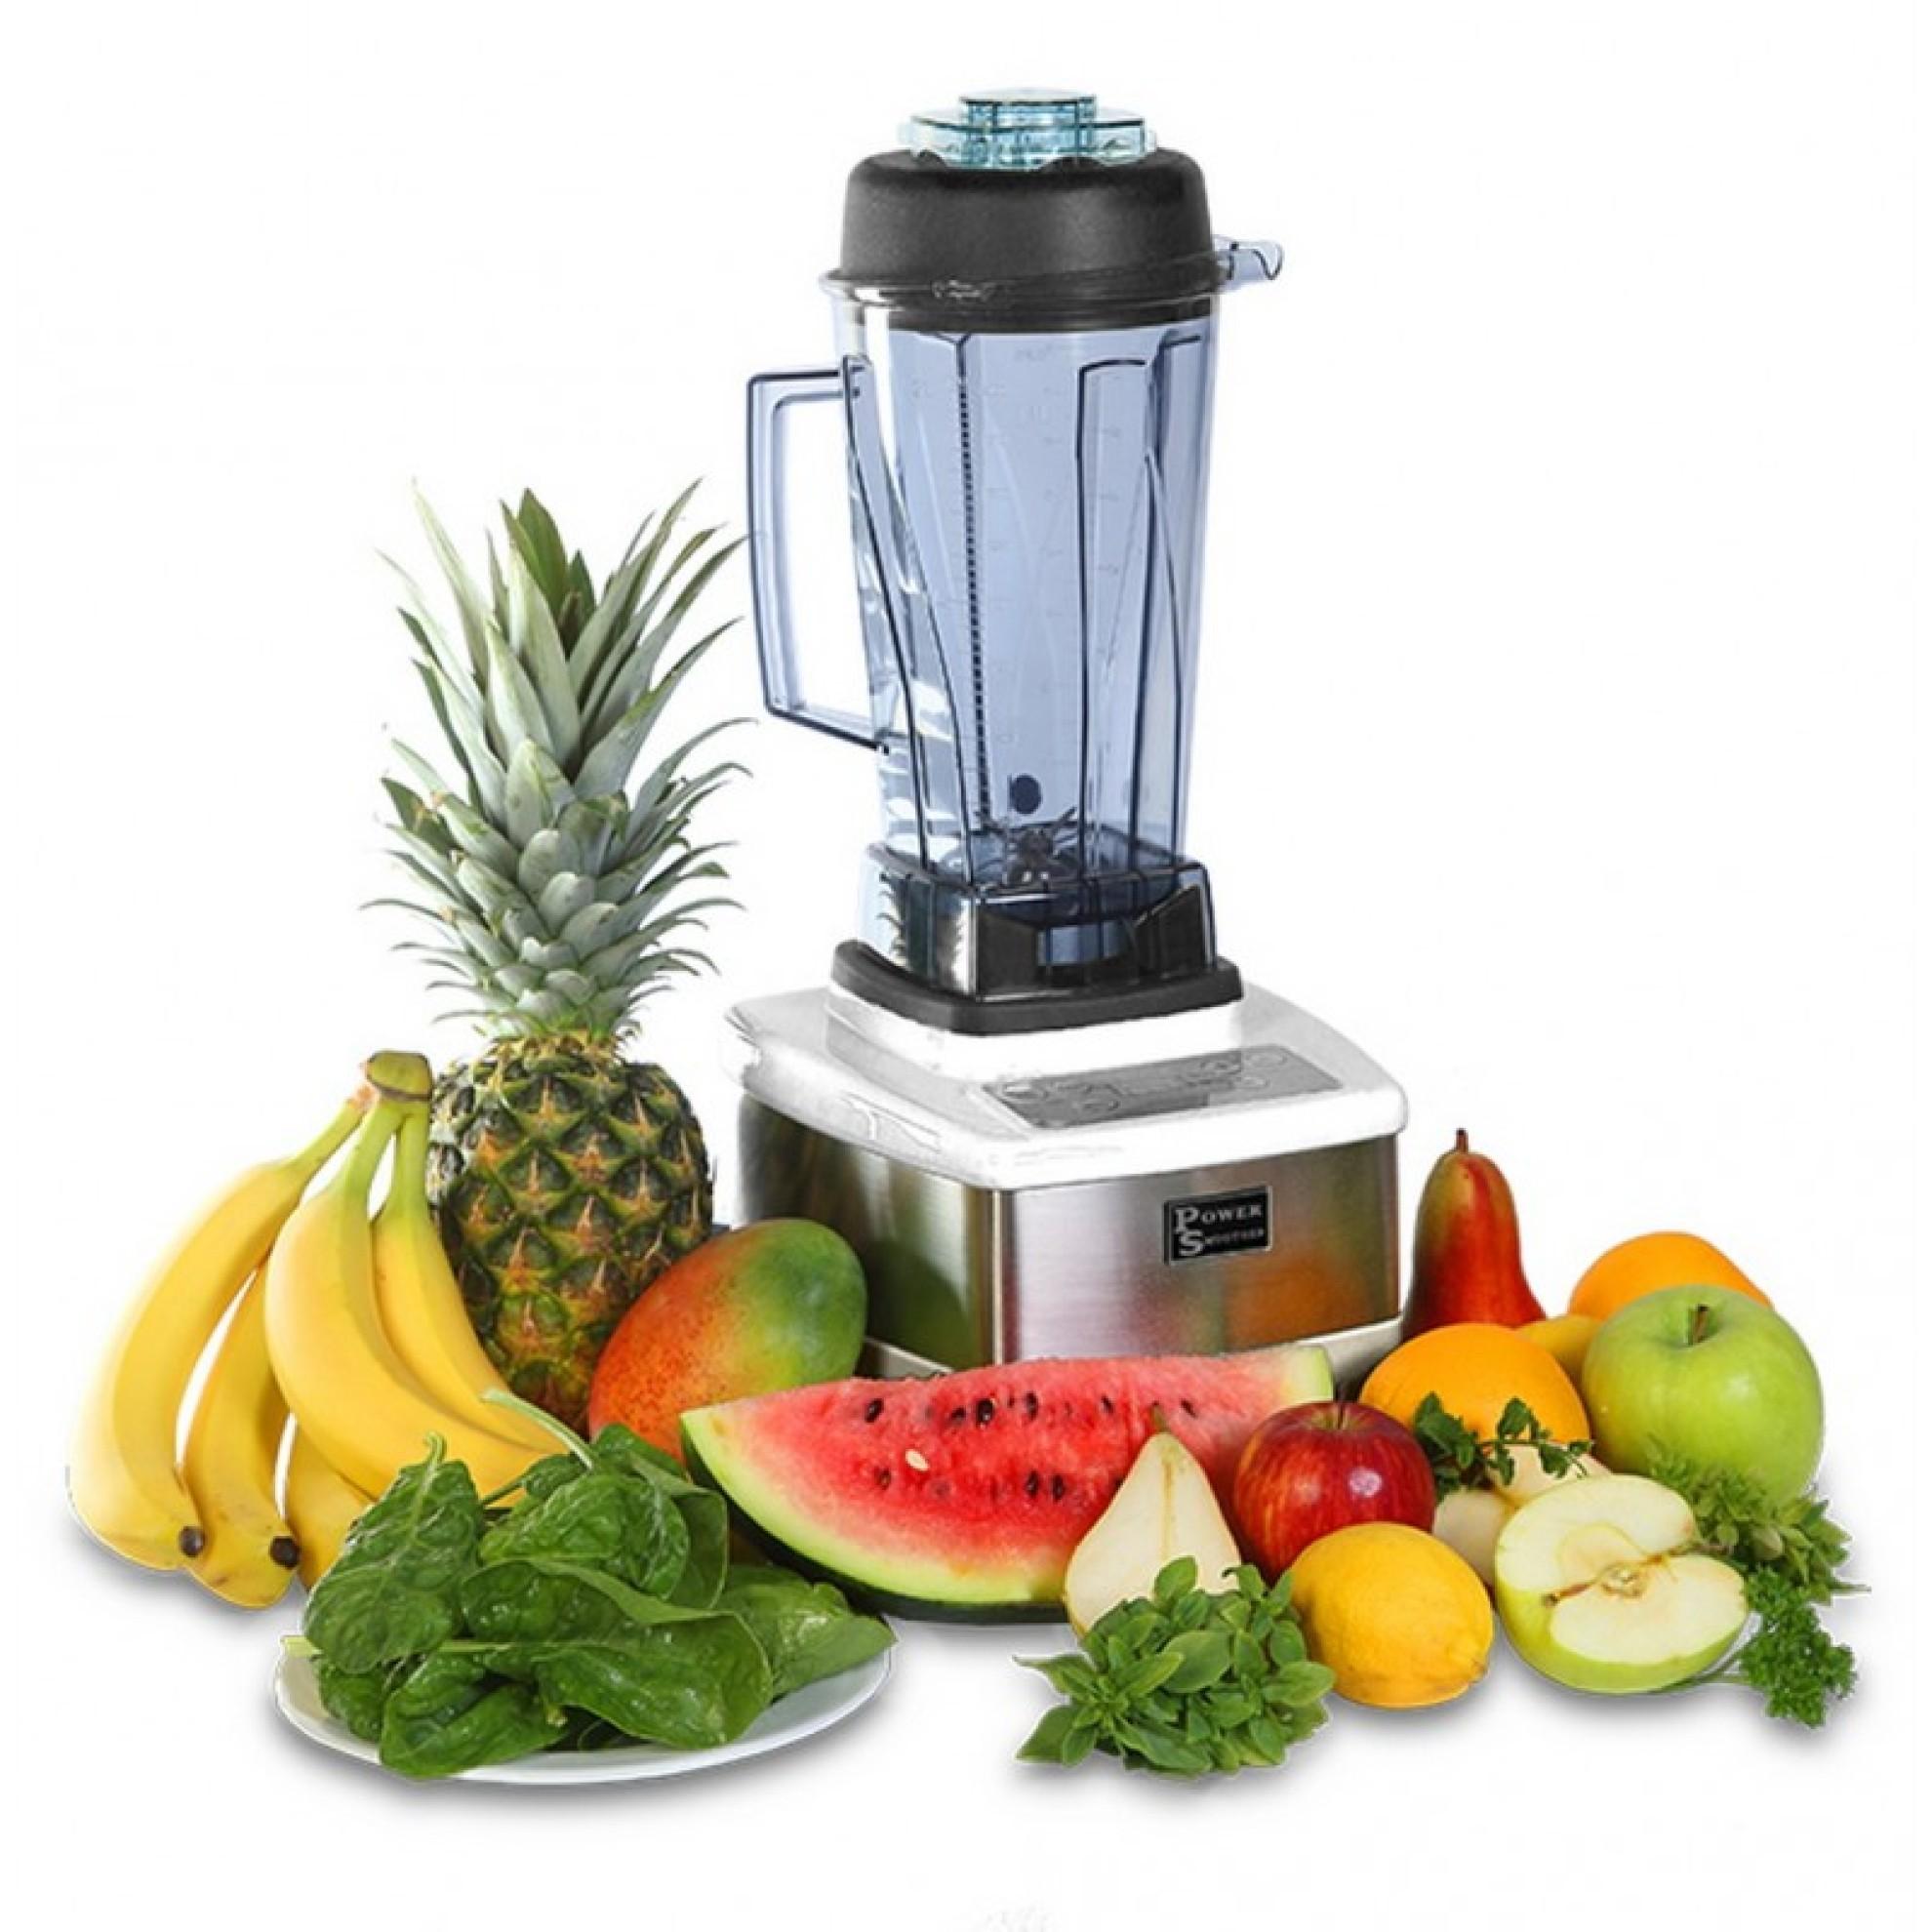 Hurom Hg Ebe 11 Slow Juicer 500 Ml : vital Energy Power Smoother, Mixer, Energie und Leben Innovative Gesundheit - feetup